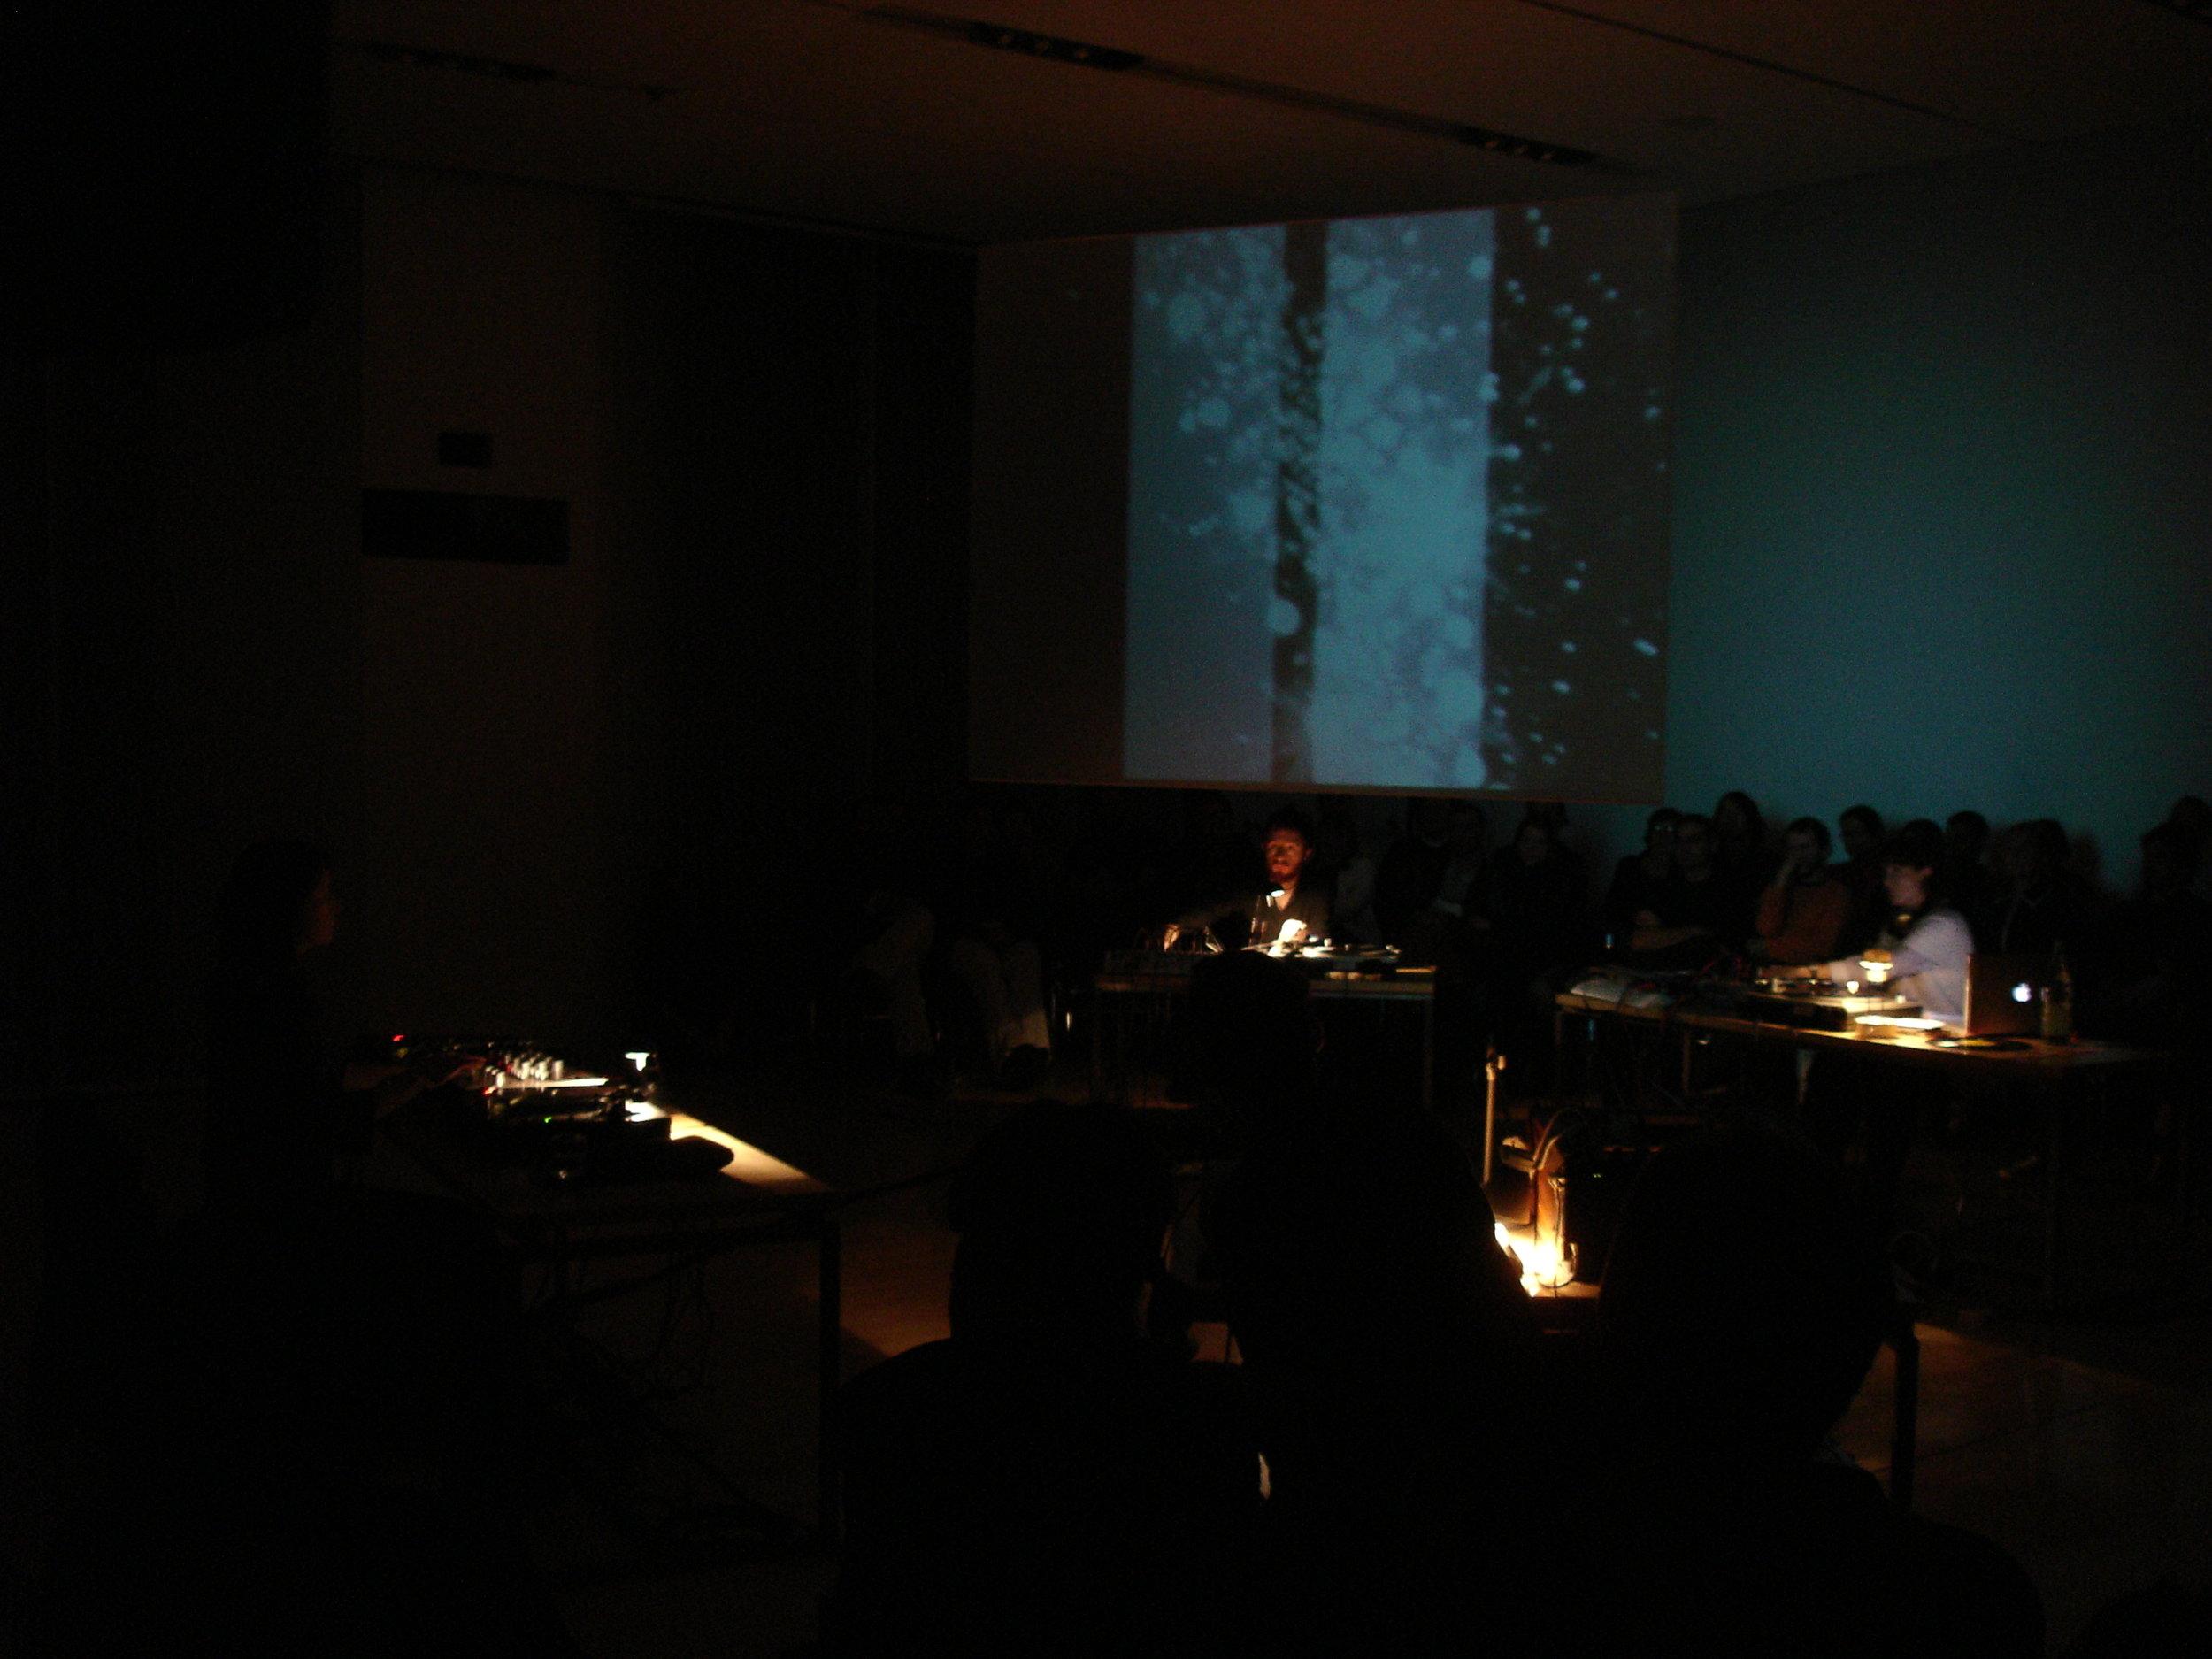 WHITE LINES, 2006, performance view with Marina Rosenfeld, Stefano Pilia, Letizia Renzini, Valerio Tricoli, The British School at Rome, Rome, Italy